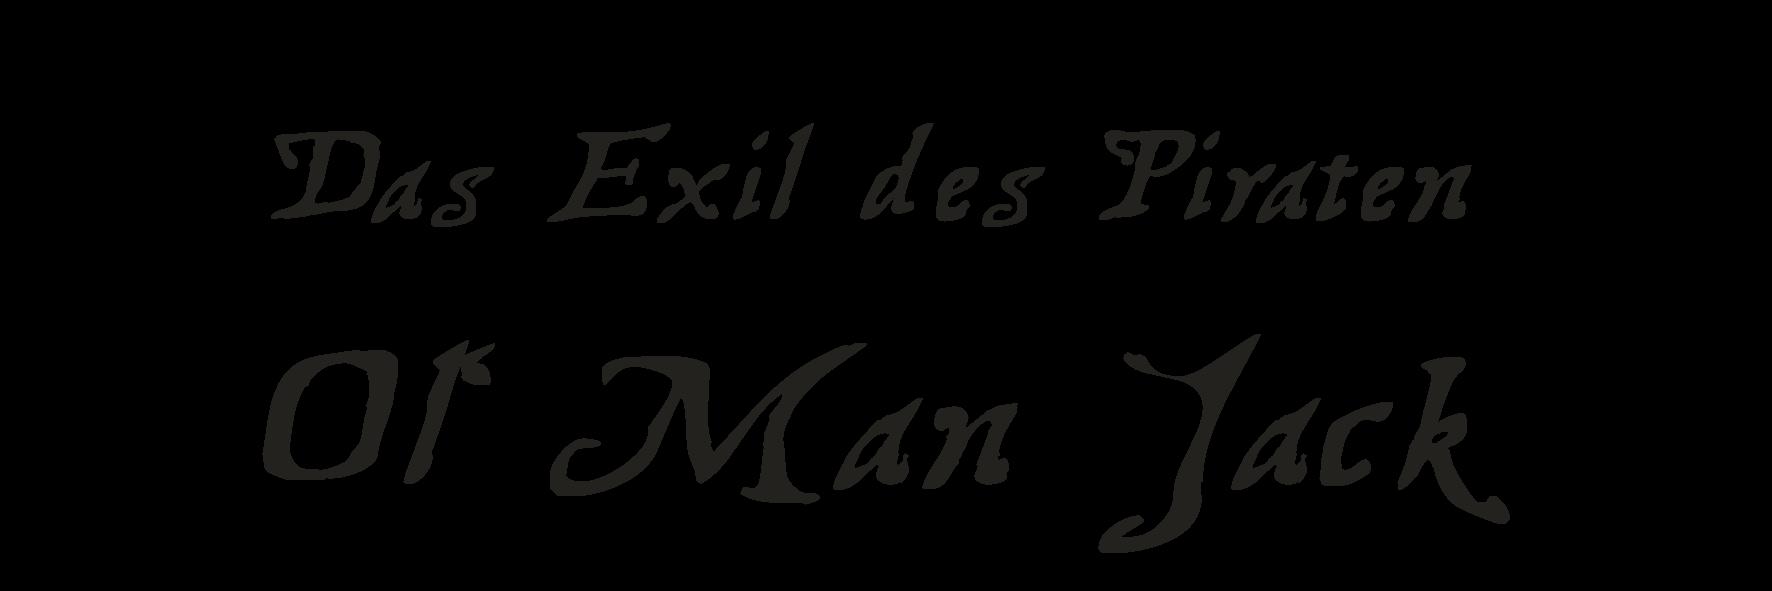 Das Exil des Piraten Ol' Man Jack